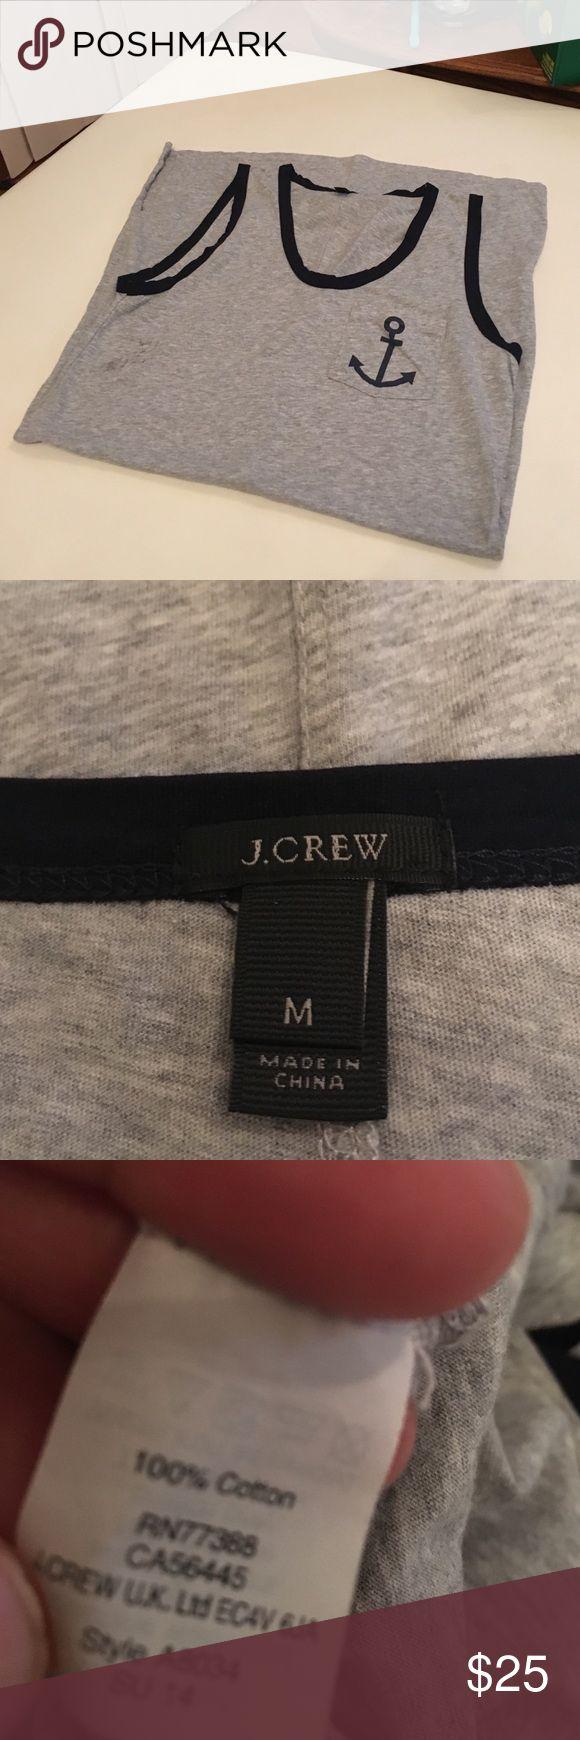 J.Crew sleepwear Cute nightgown soft 100% cotton J. Crew Intimates & Sleepwear